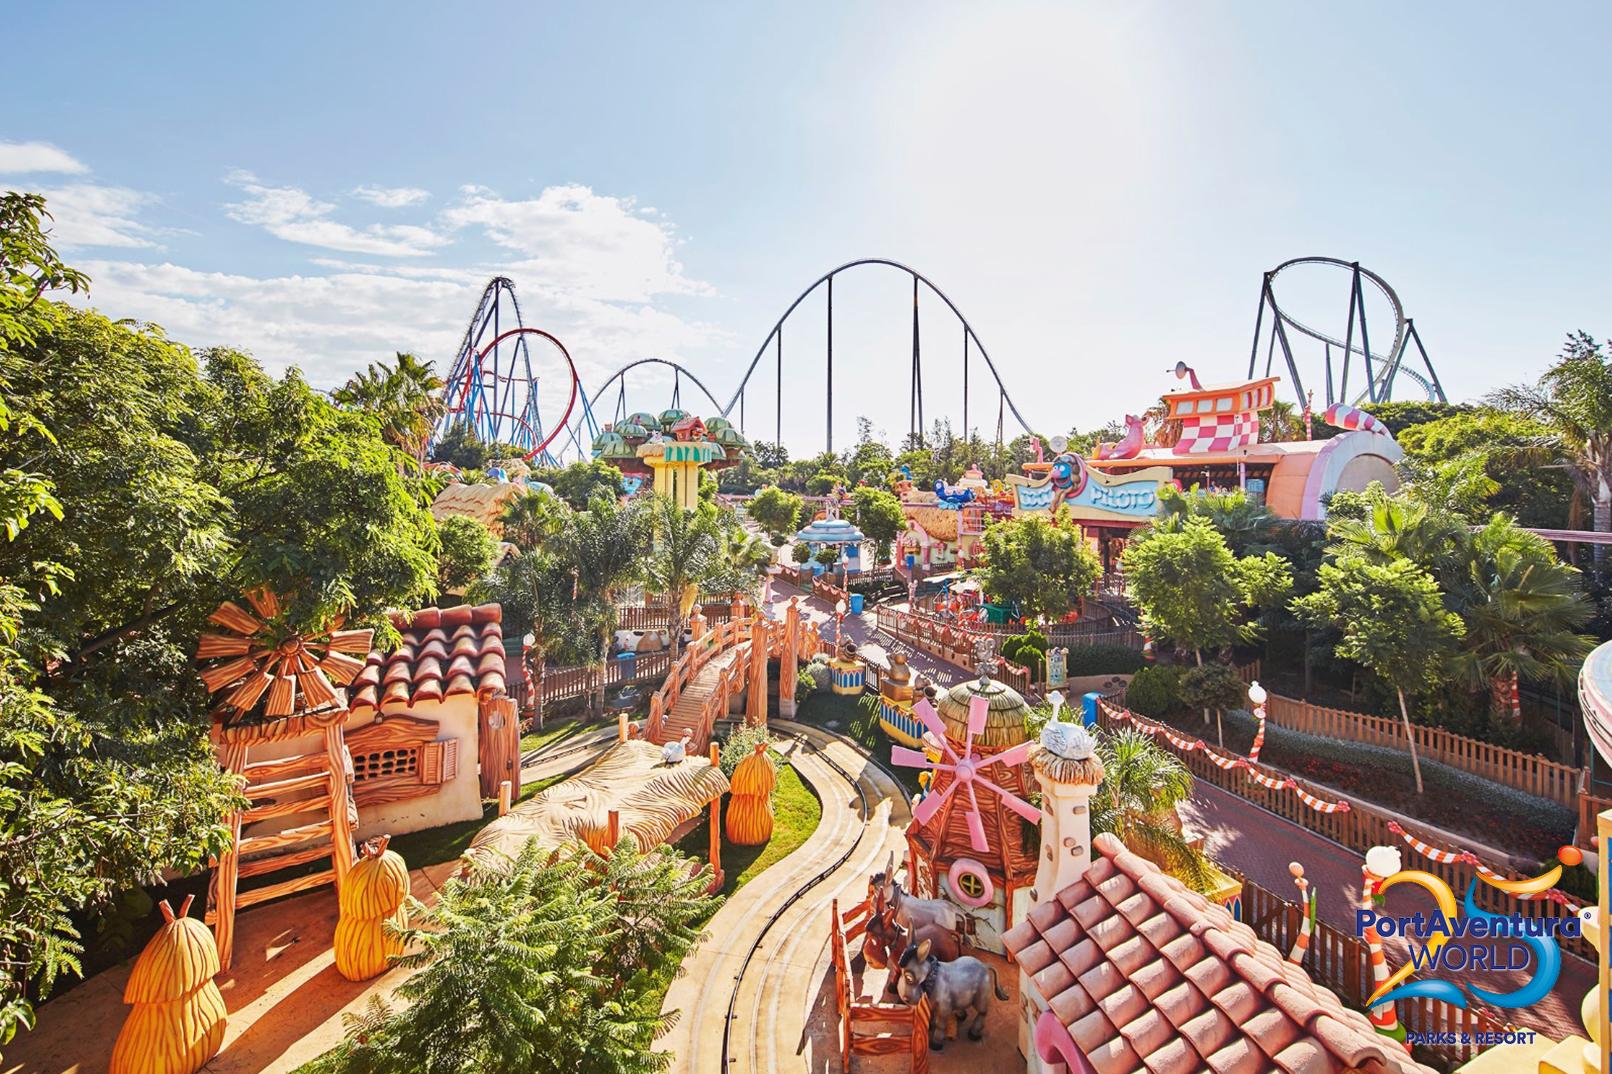 PortAventura Theme Park Tarragona